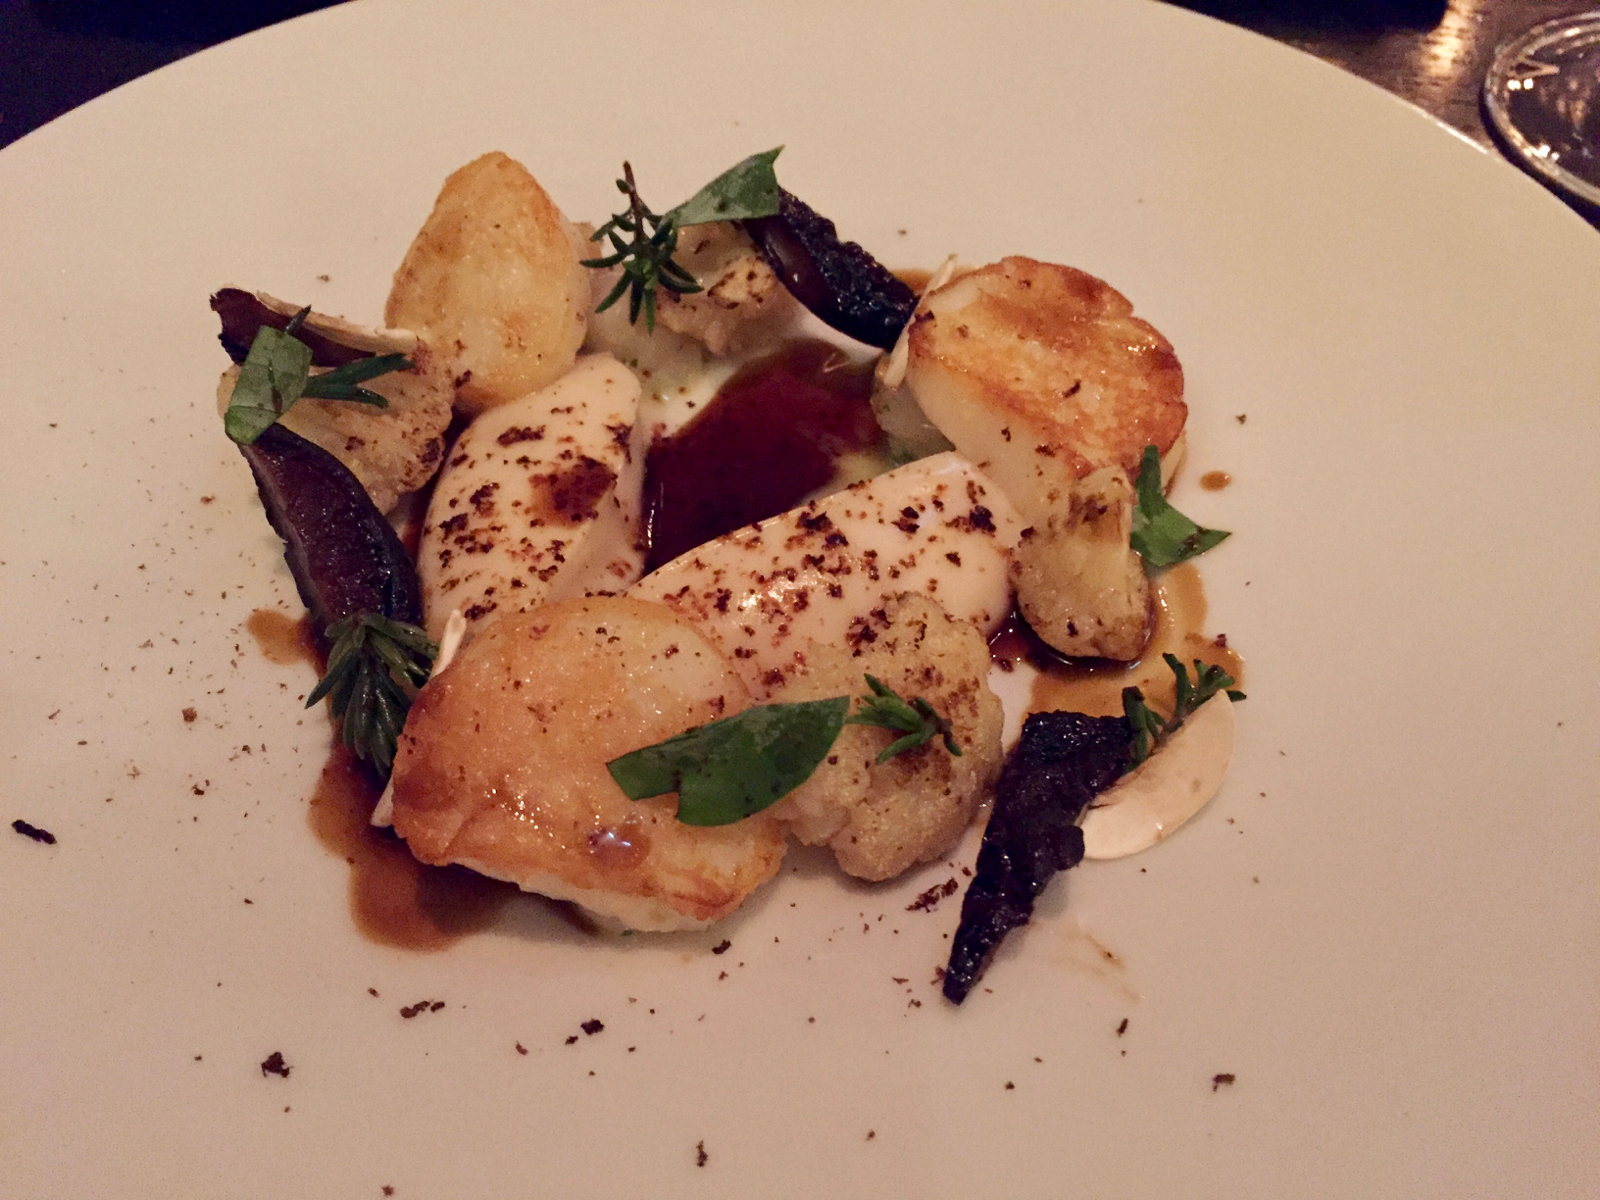 Sherried Scallop at Dinner by Heston Knightsbridge